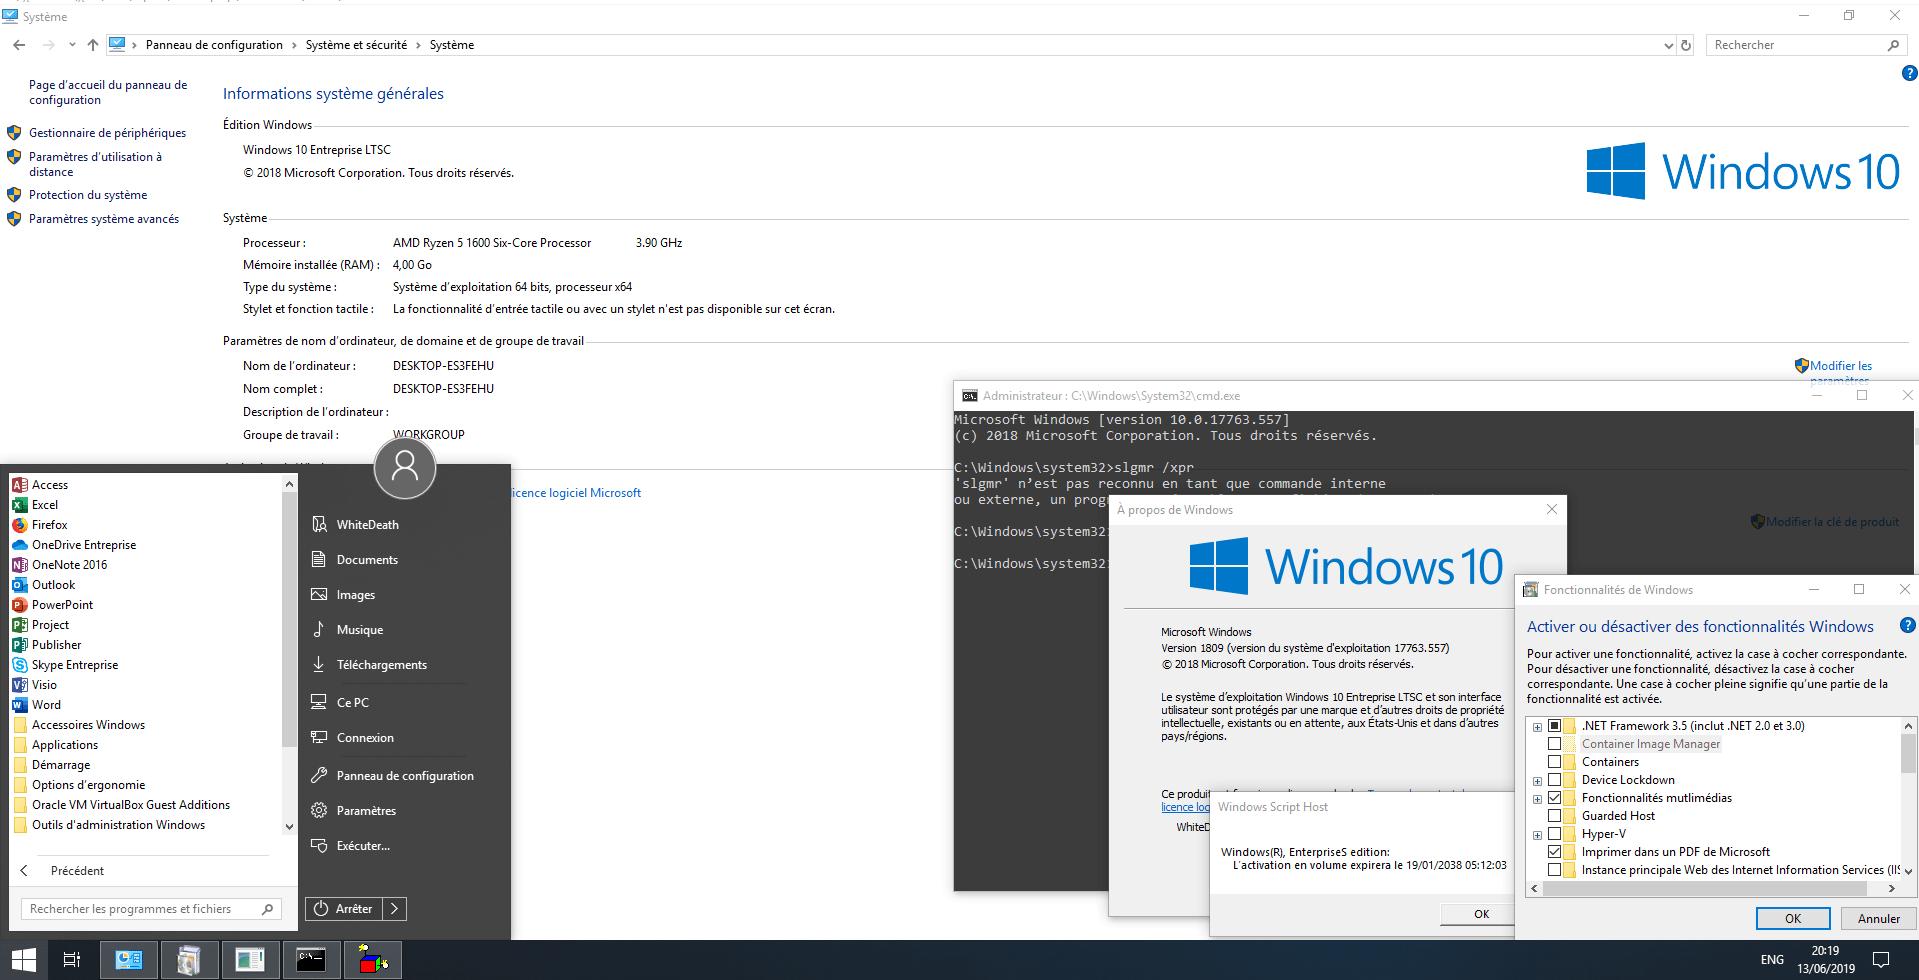 Windows 10 Ltsc Pro